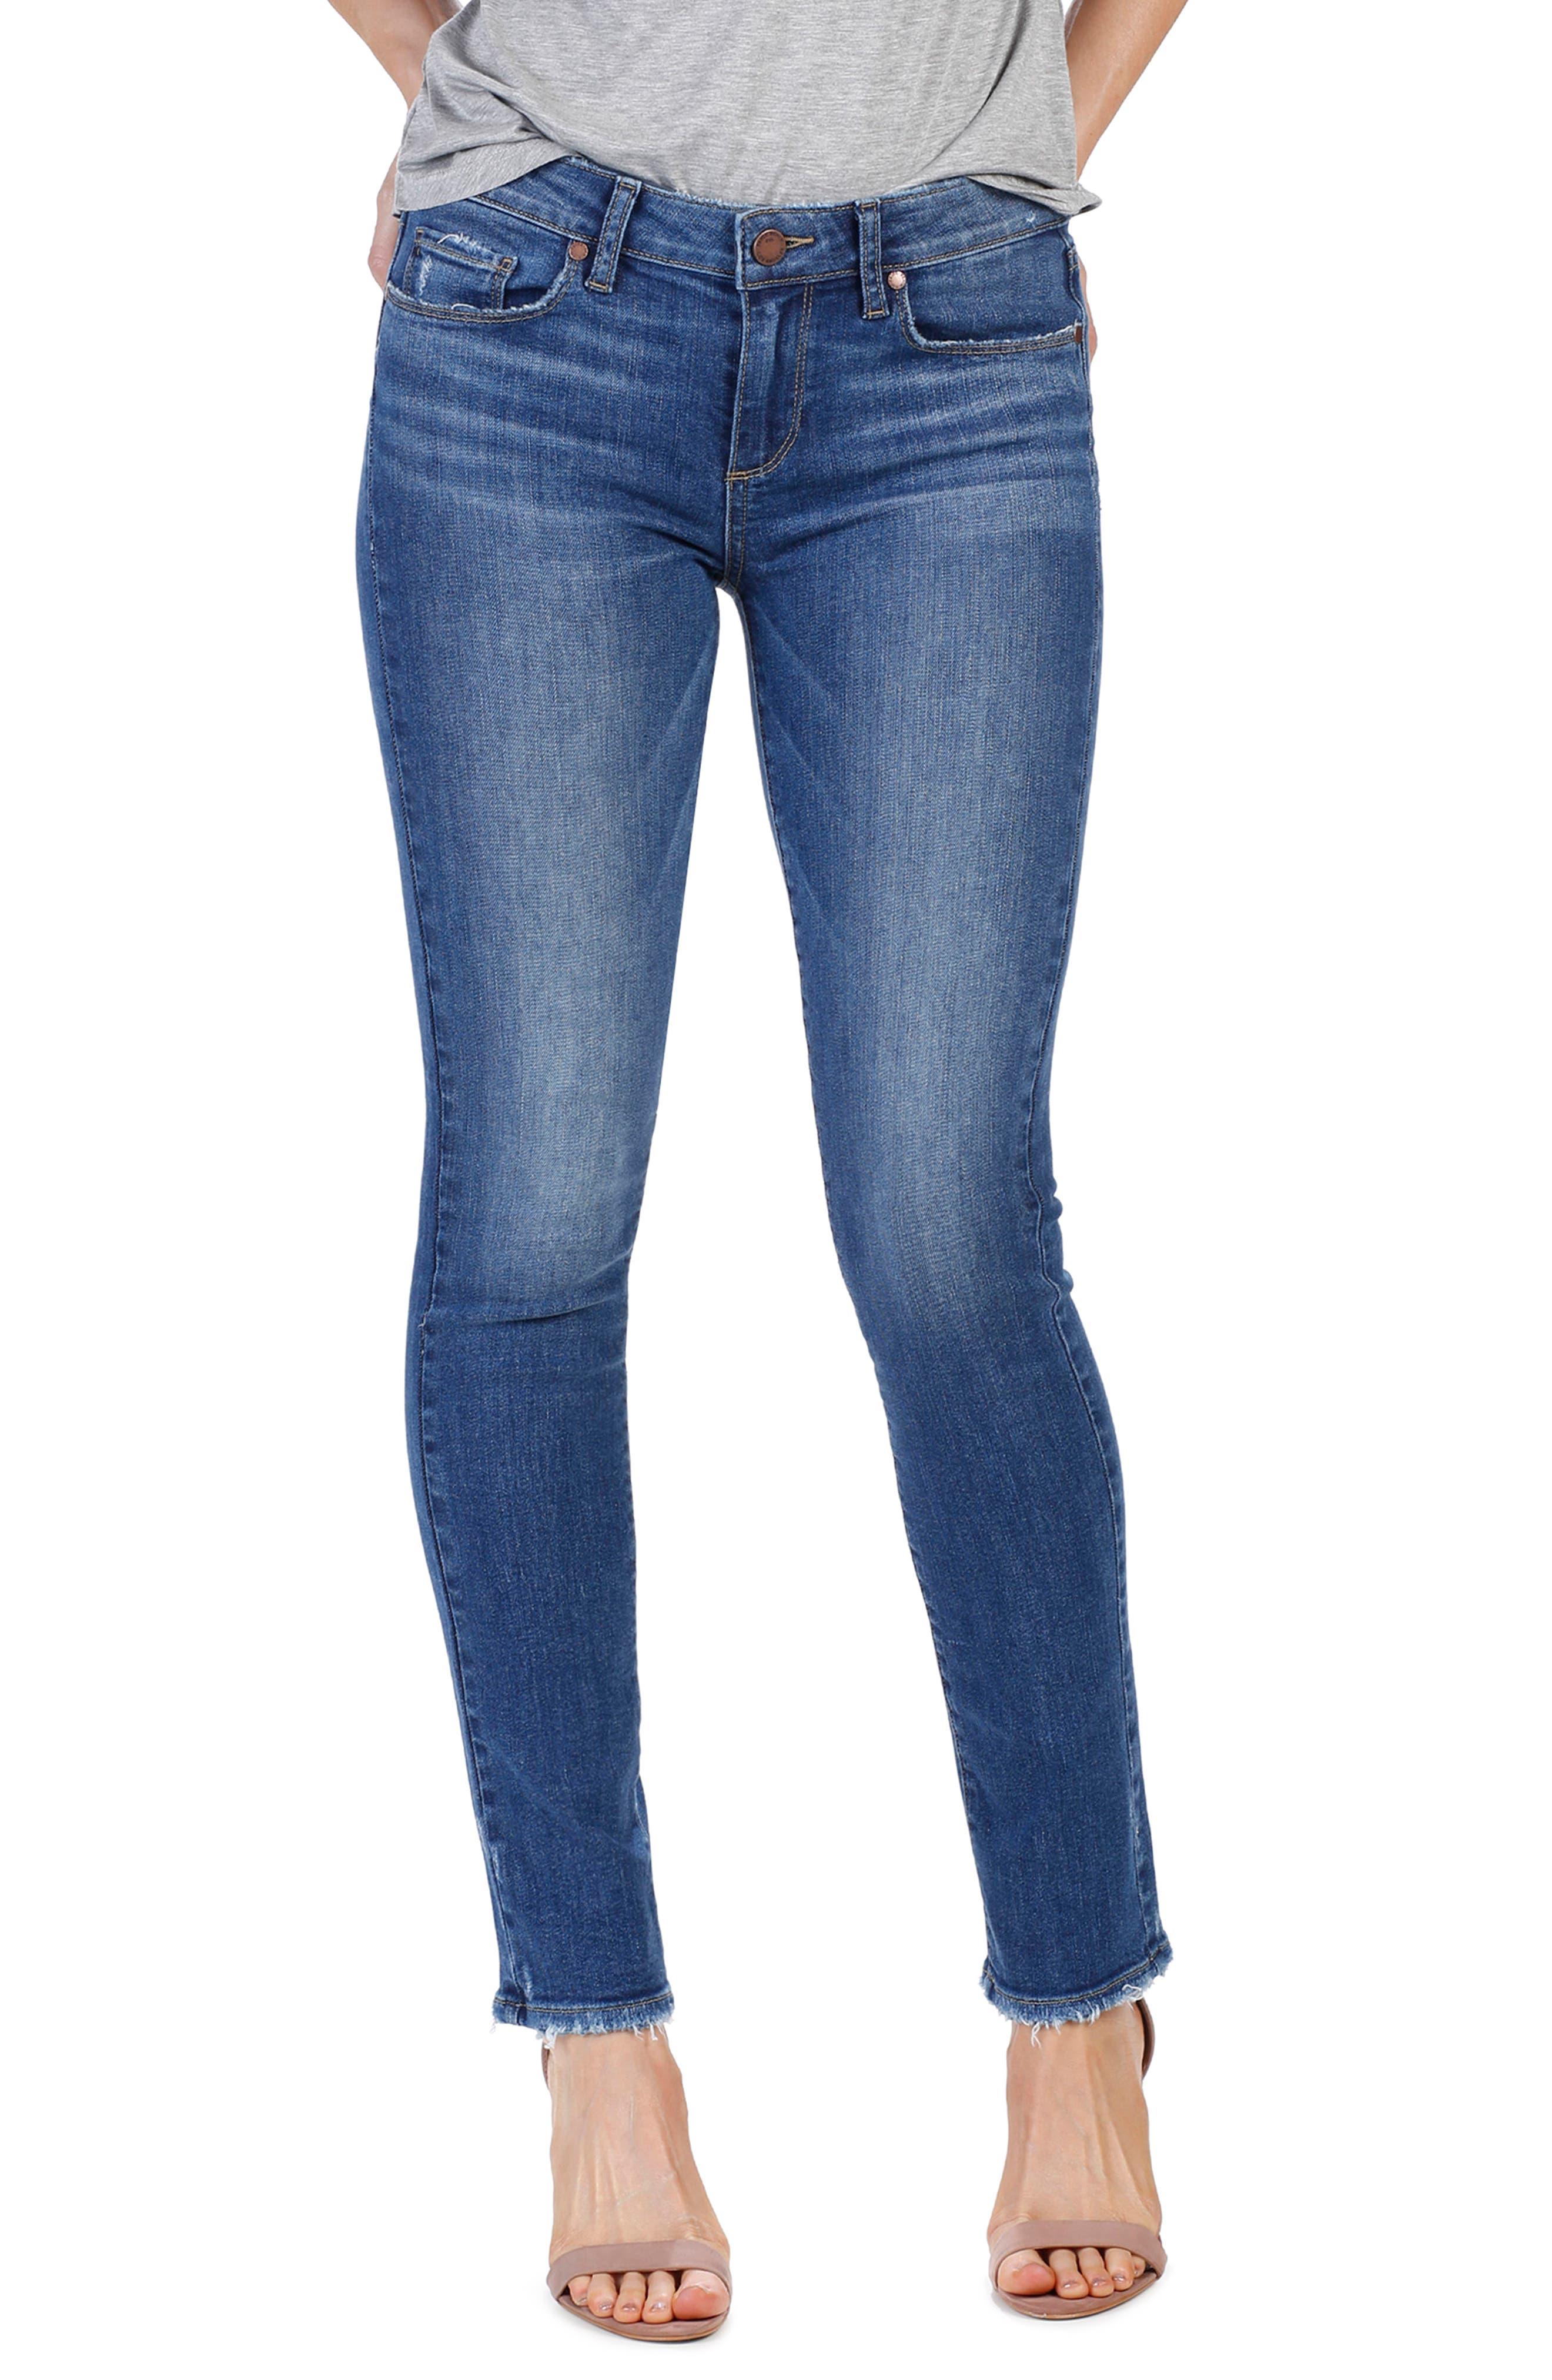 Skyline Skinny Jeans,                             Main thumbnail 1, color,                             Bali